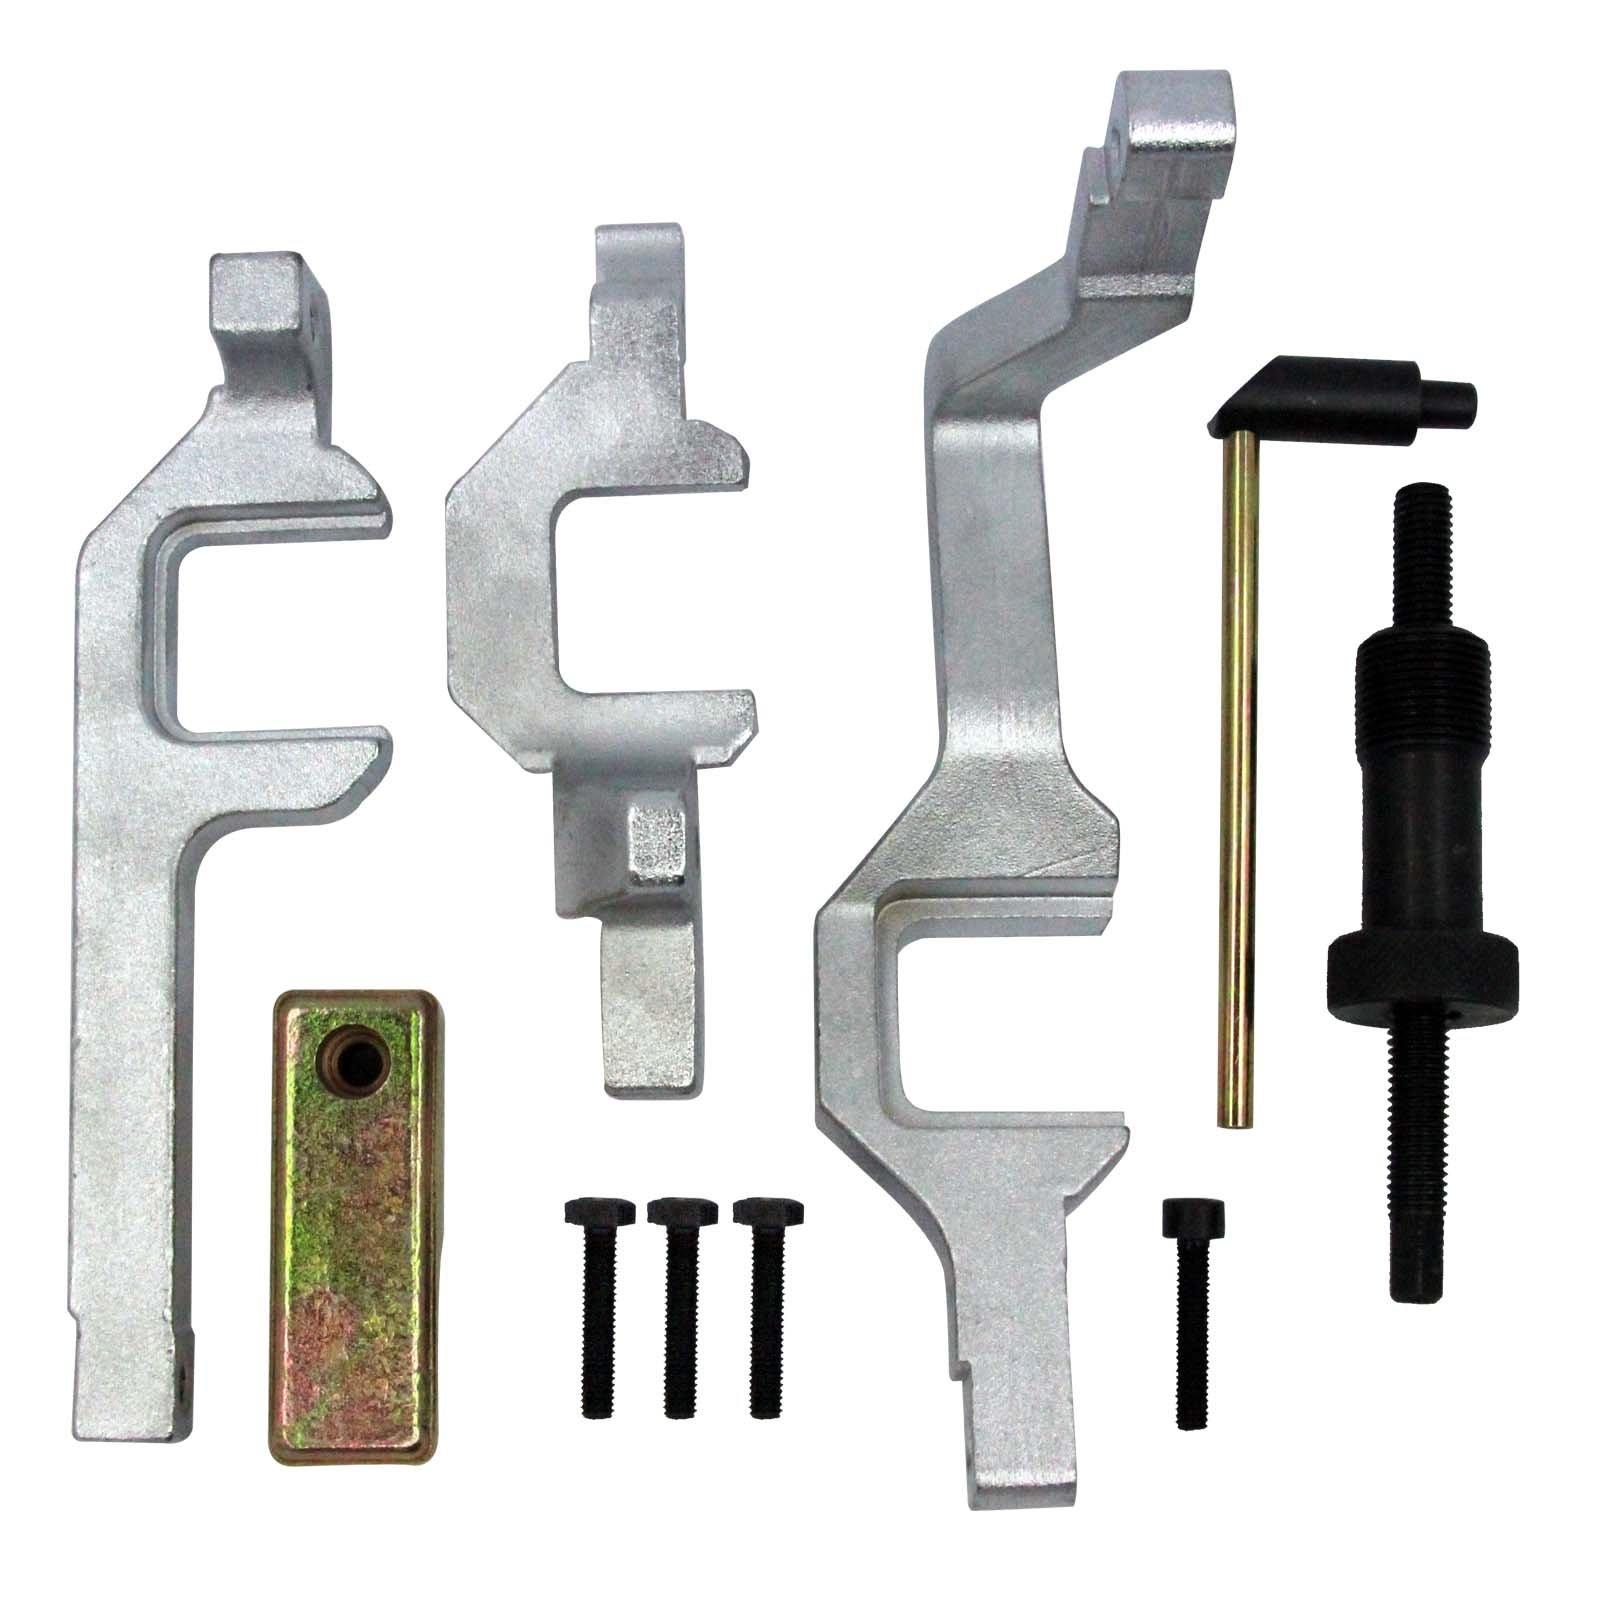 AURELIO TECH LEPAZA58416 Special Engine Camshaft Alignment Timing Tool Kit R55 for Mini Cooper N12 N14 by AURELIO TECH (Image #4)